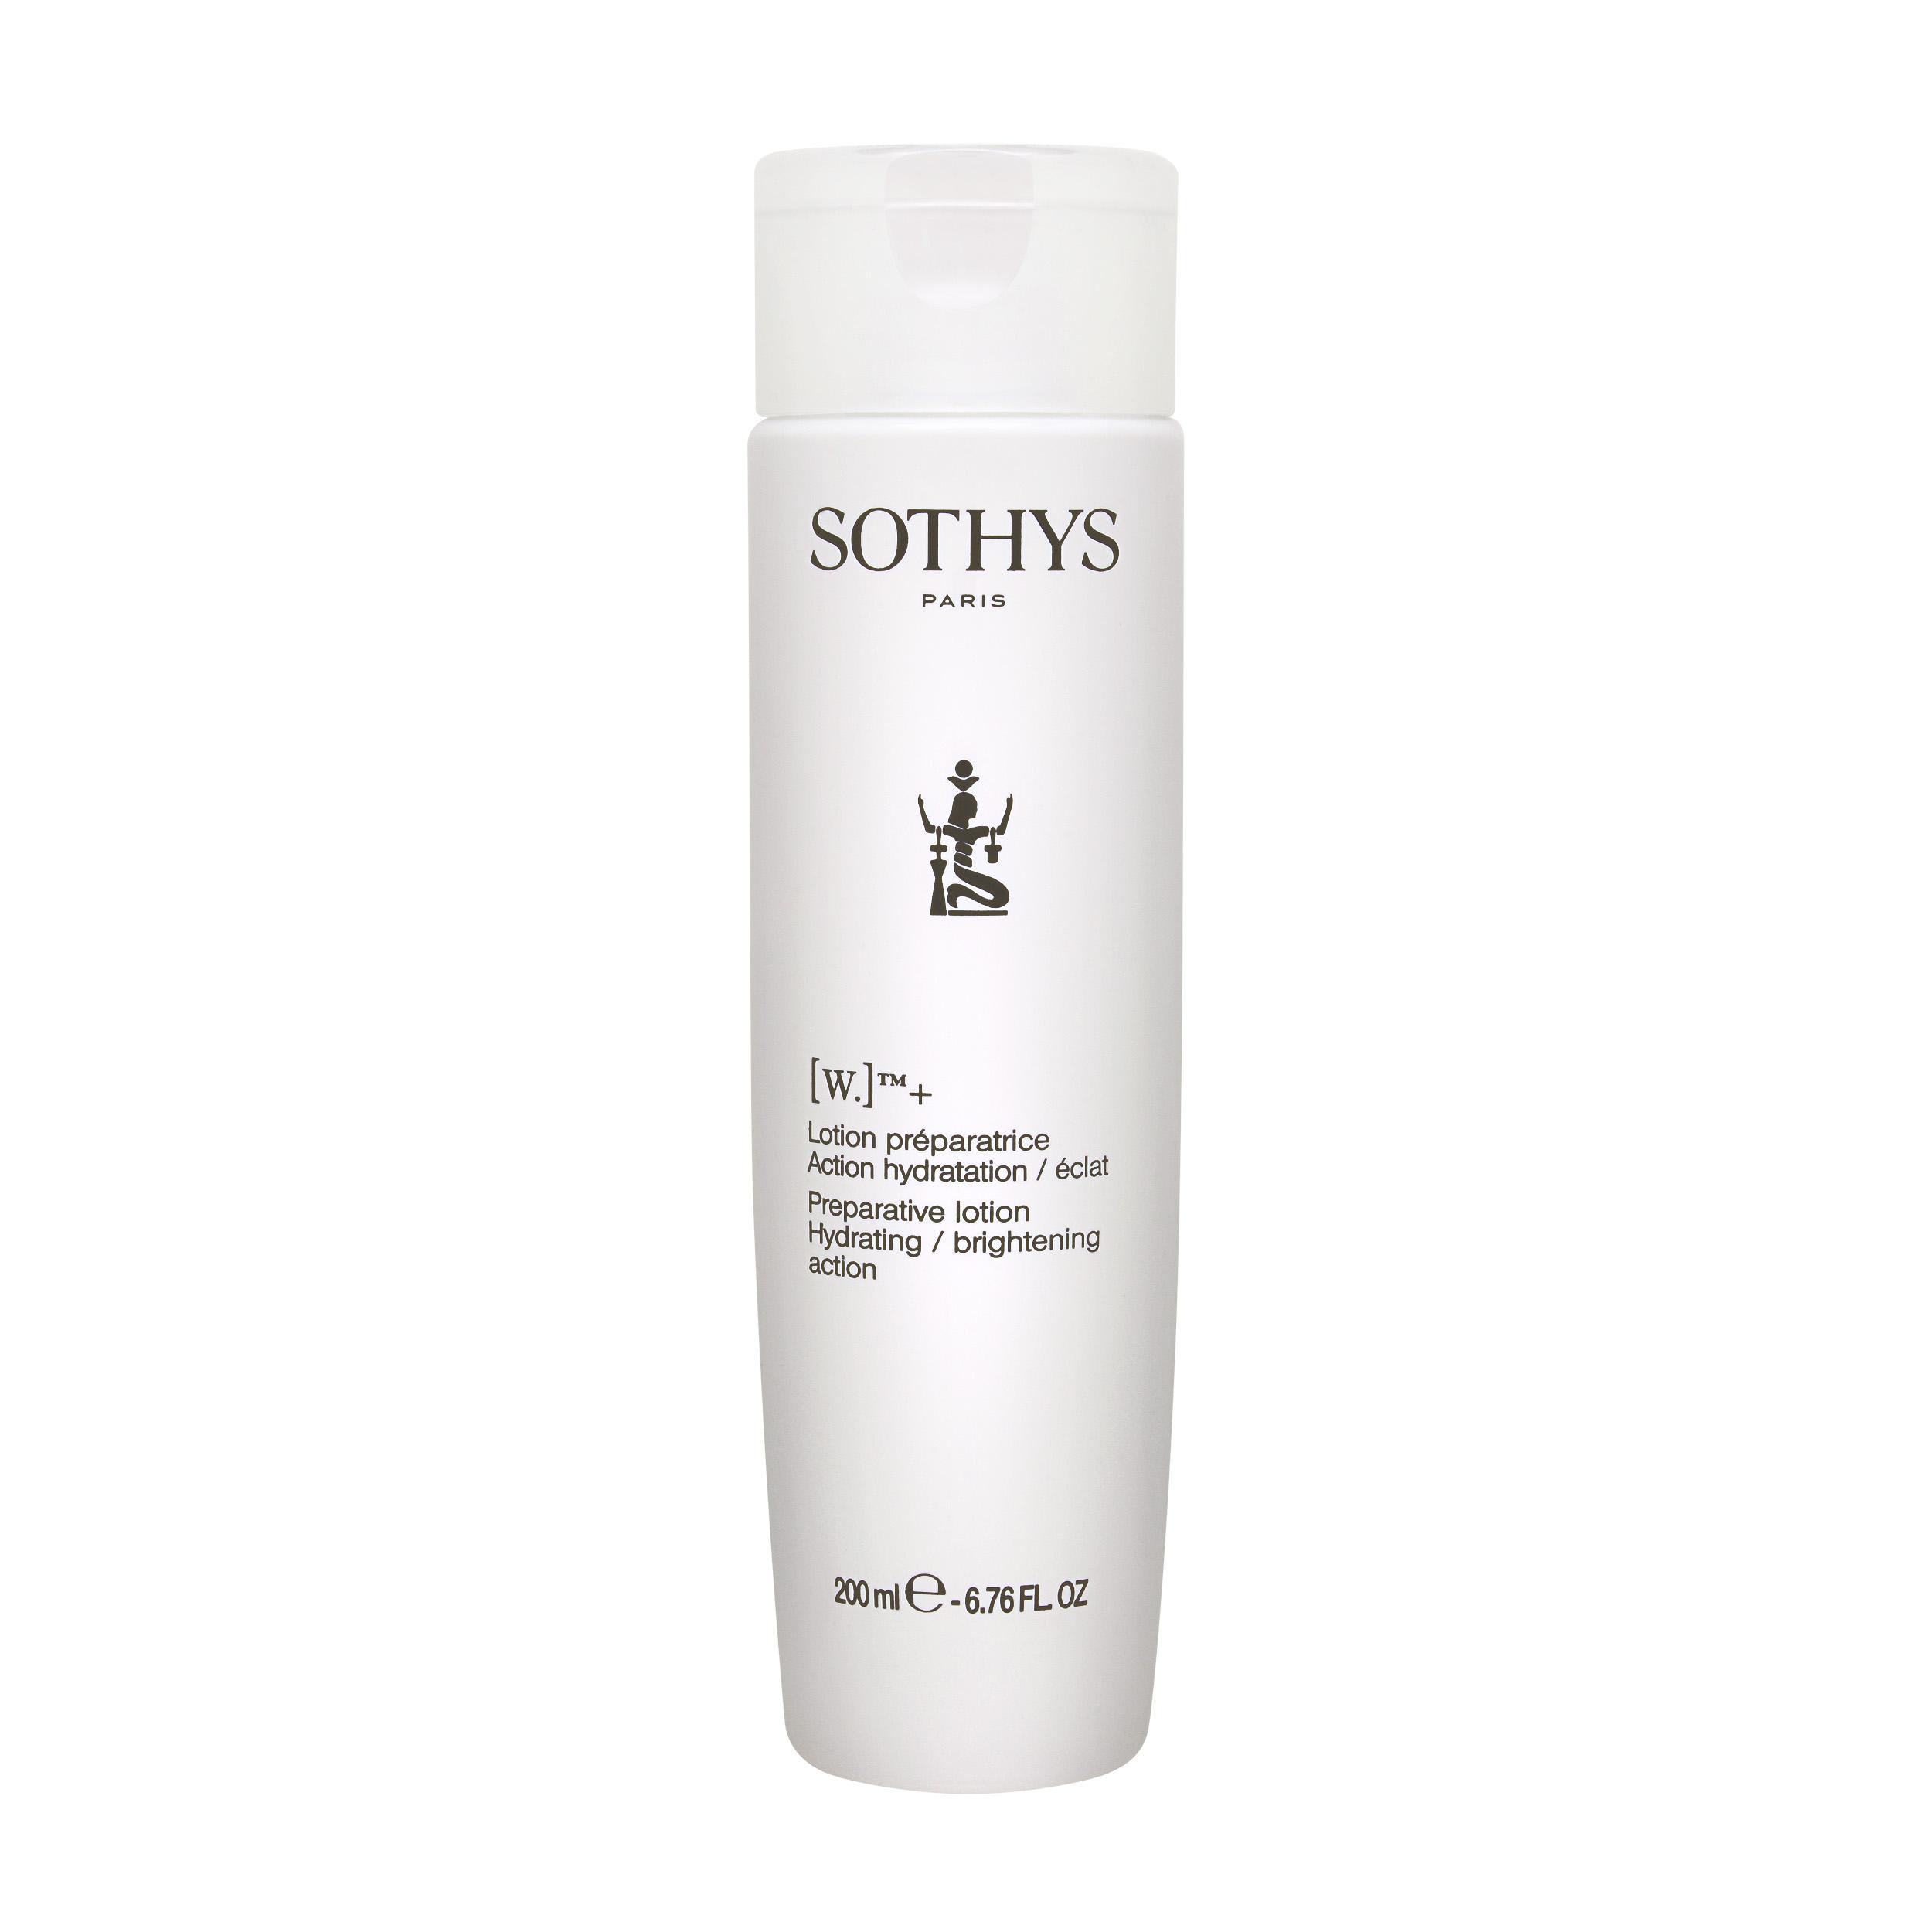 SOTHYS [W.]+  Brightening Preparative Lotion 6.76oz, 200ml